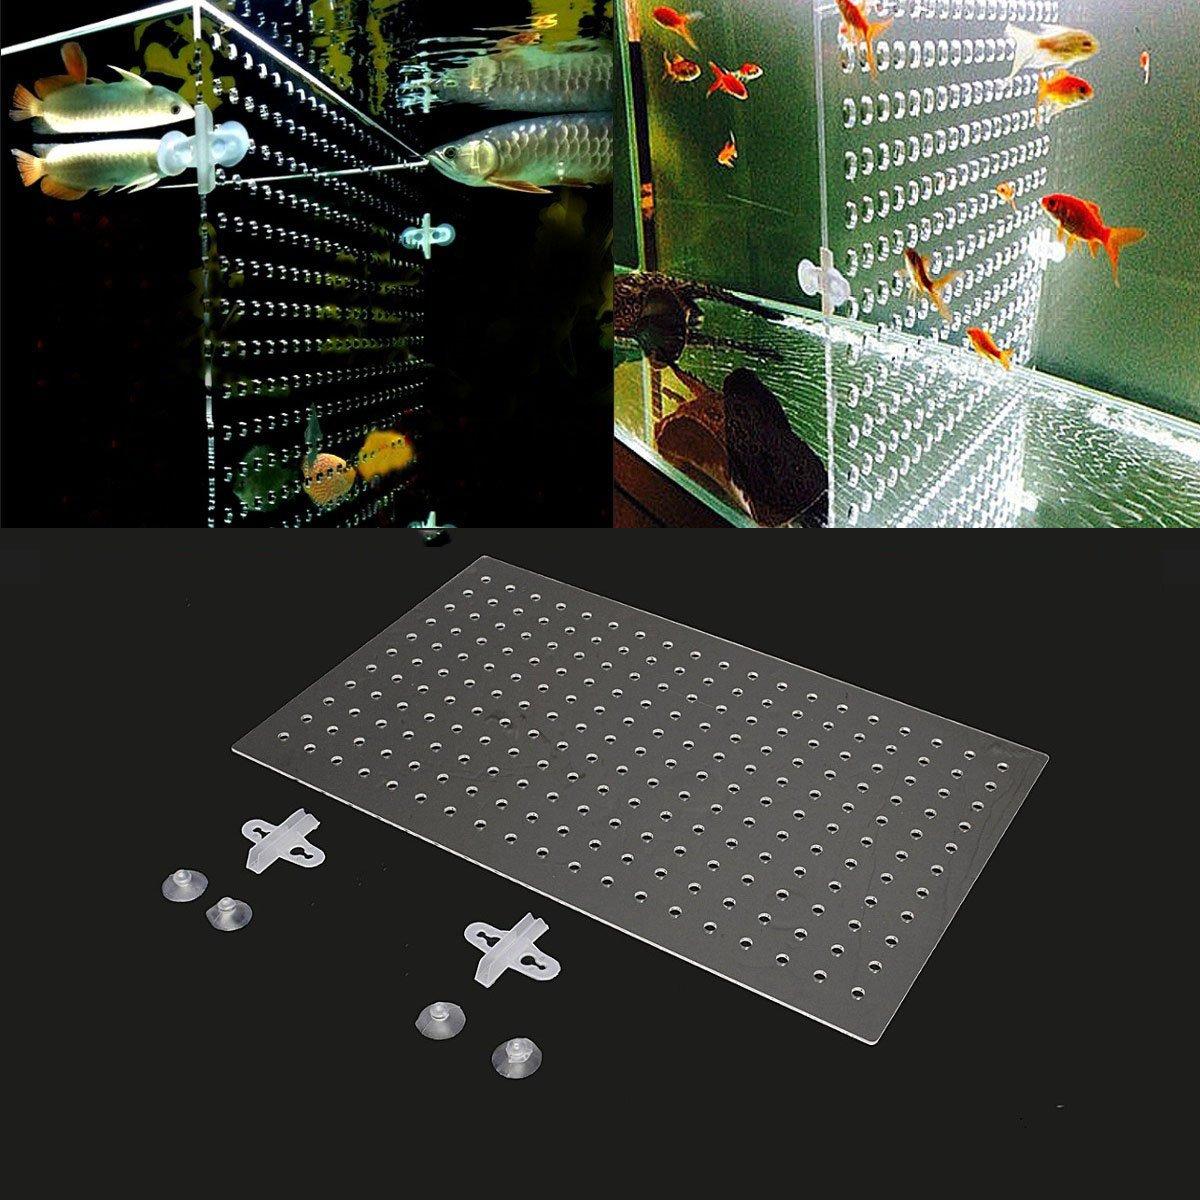 EsportsMJJ 19x11 8 Aquarium 3mm Acrylic Divider With Holes